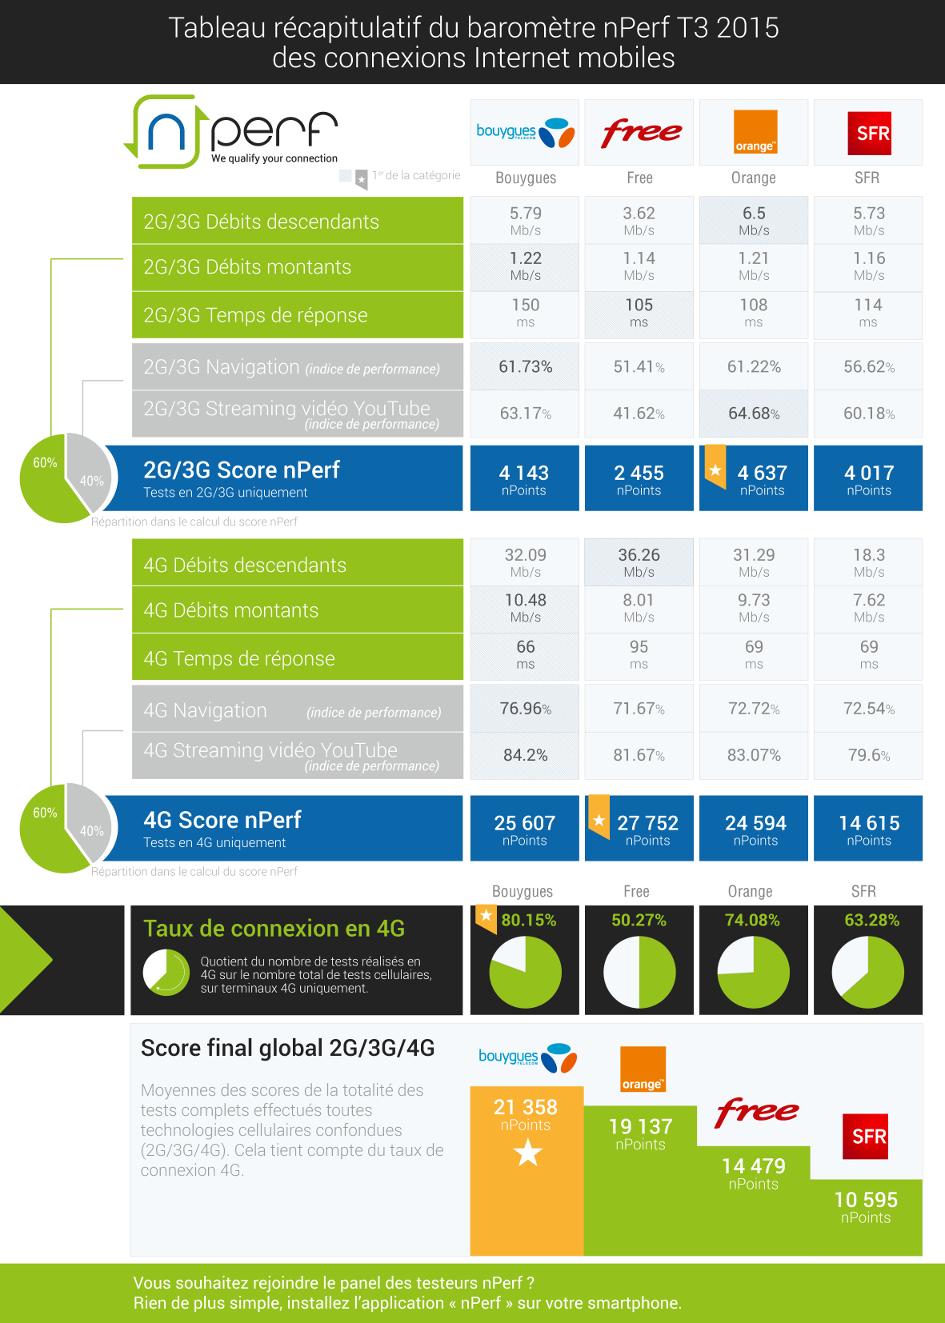 nPerf-connexions-Internet-mobiles-T3-2015